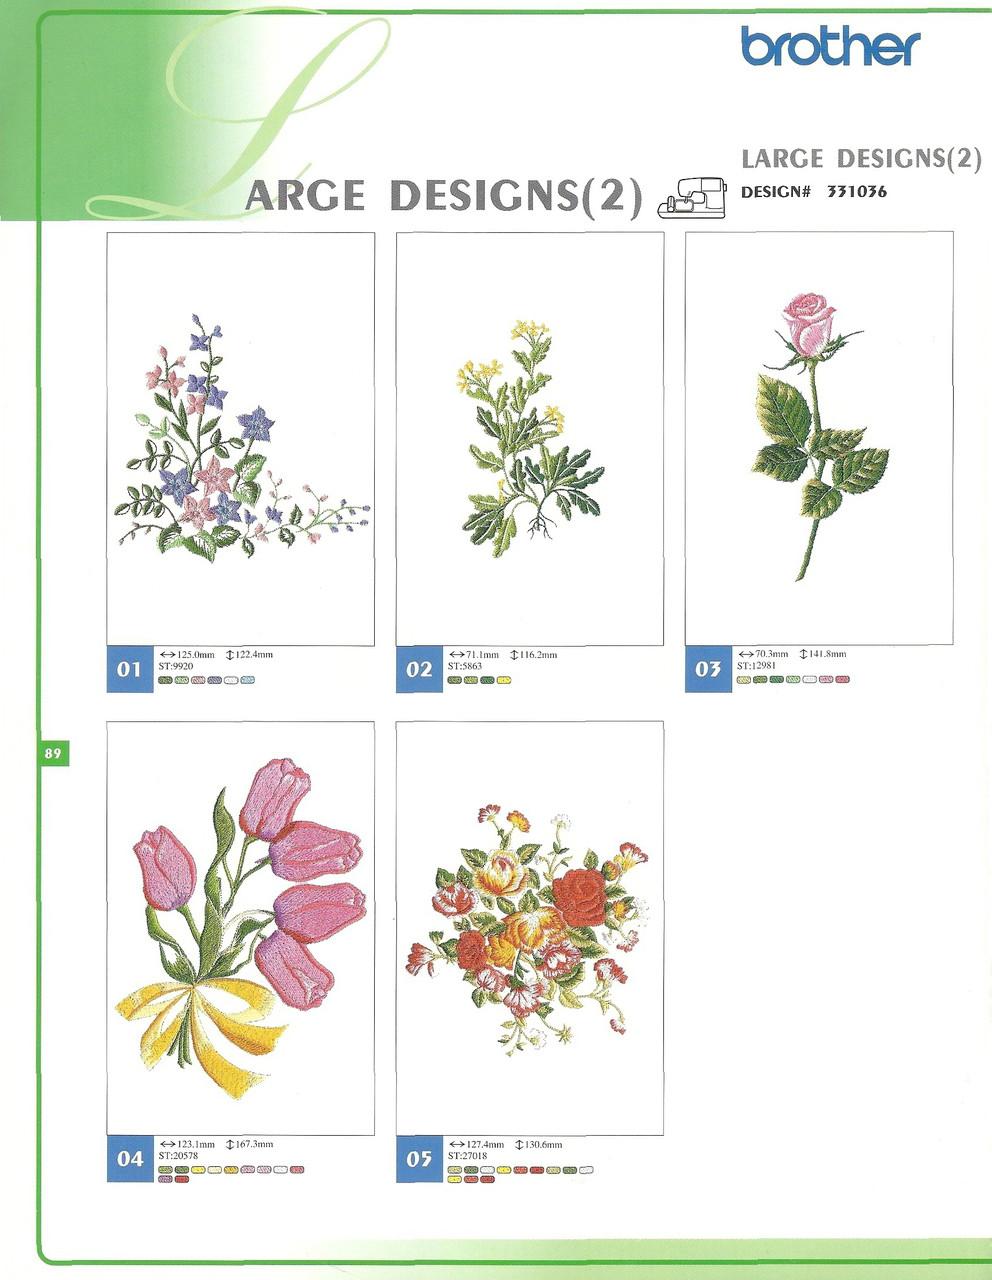 331036 Large Designs II_02